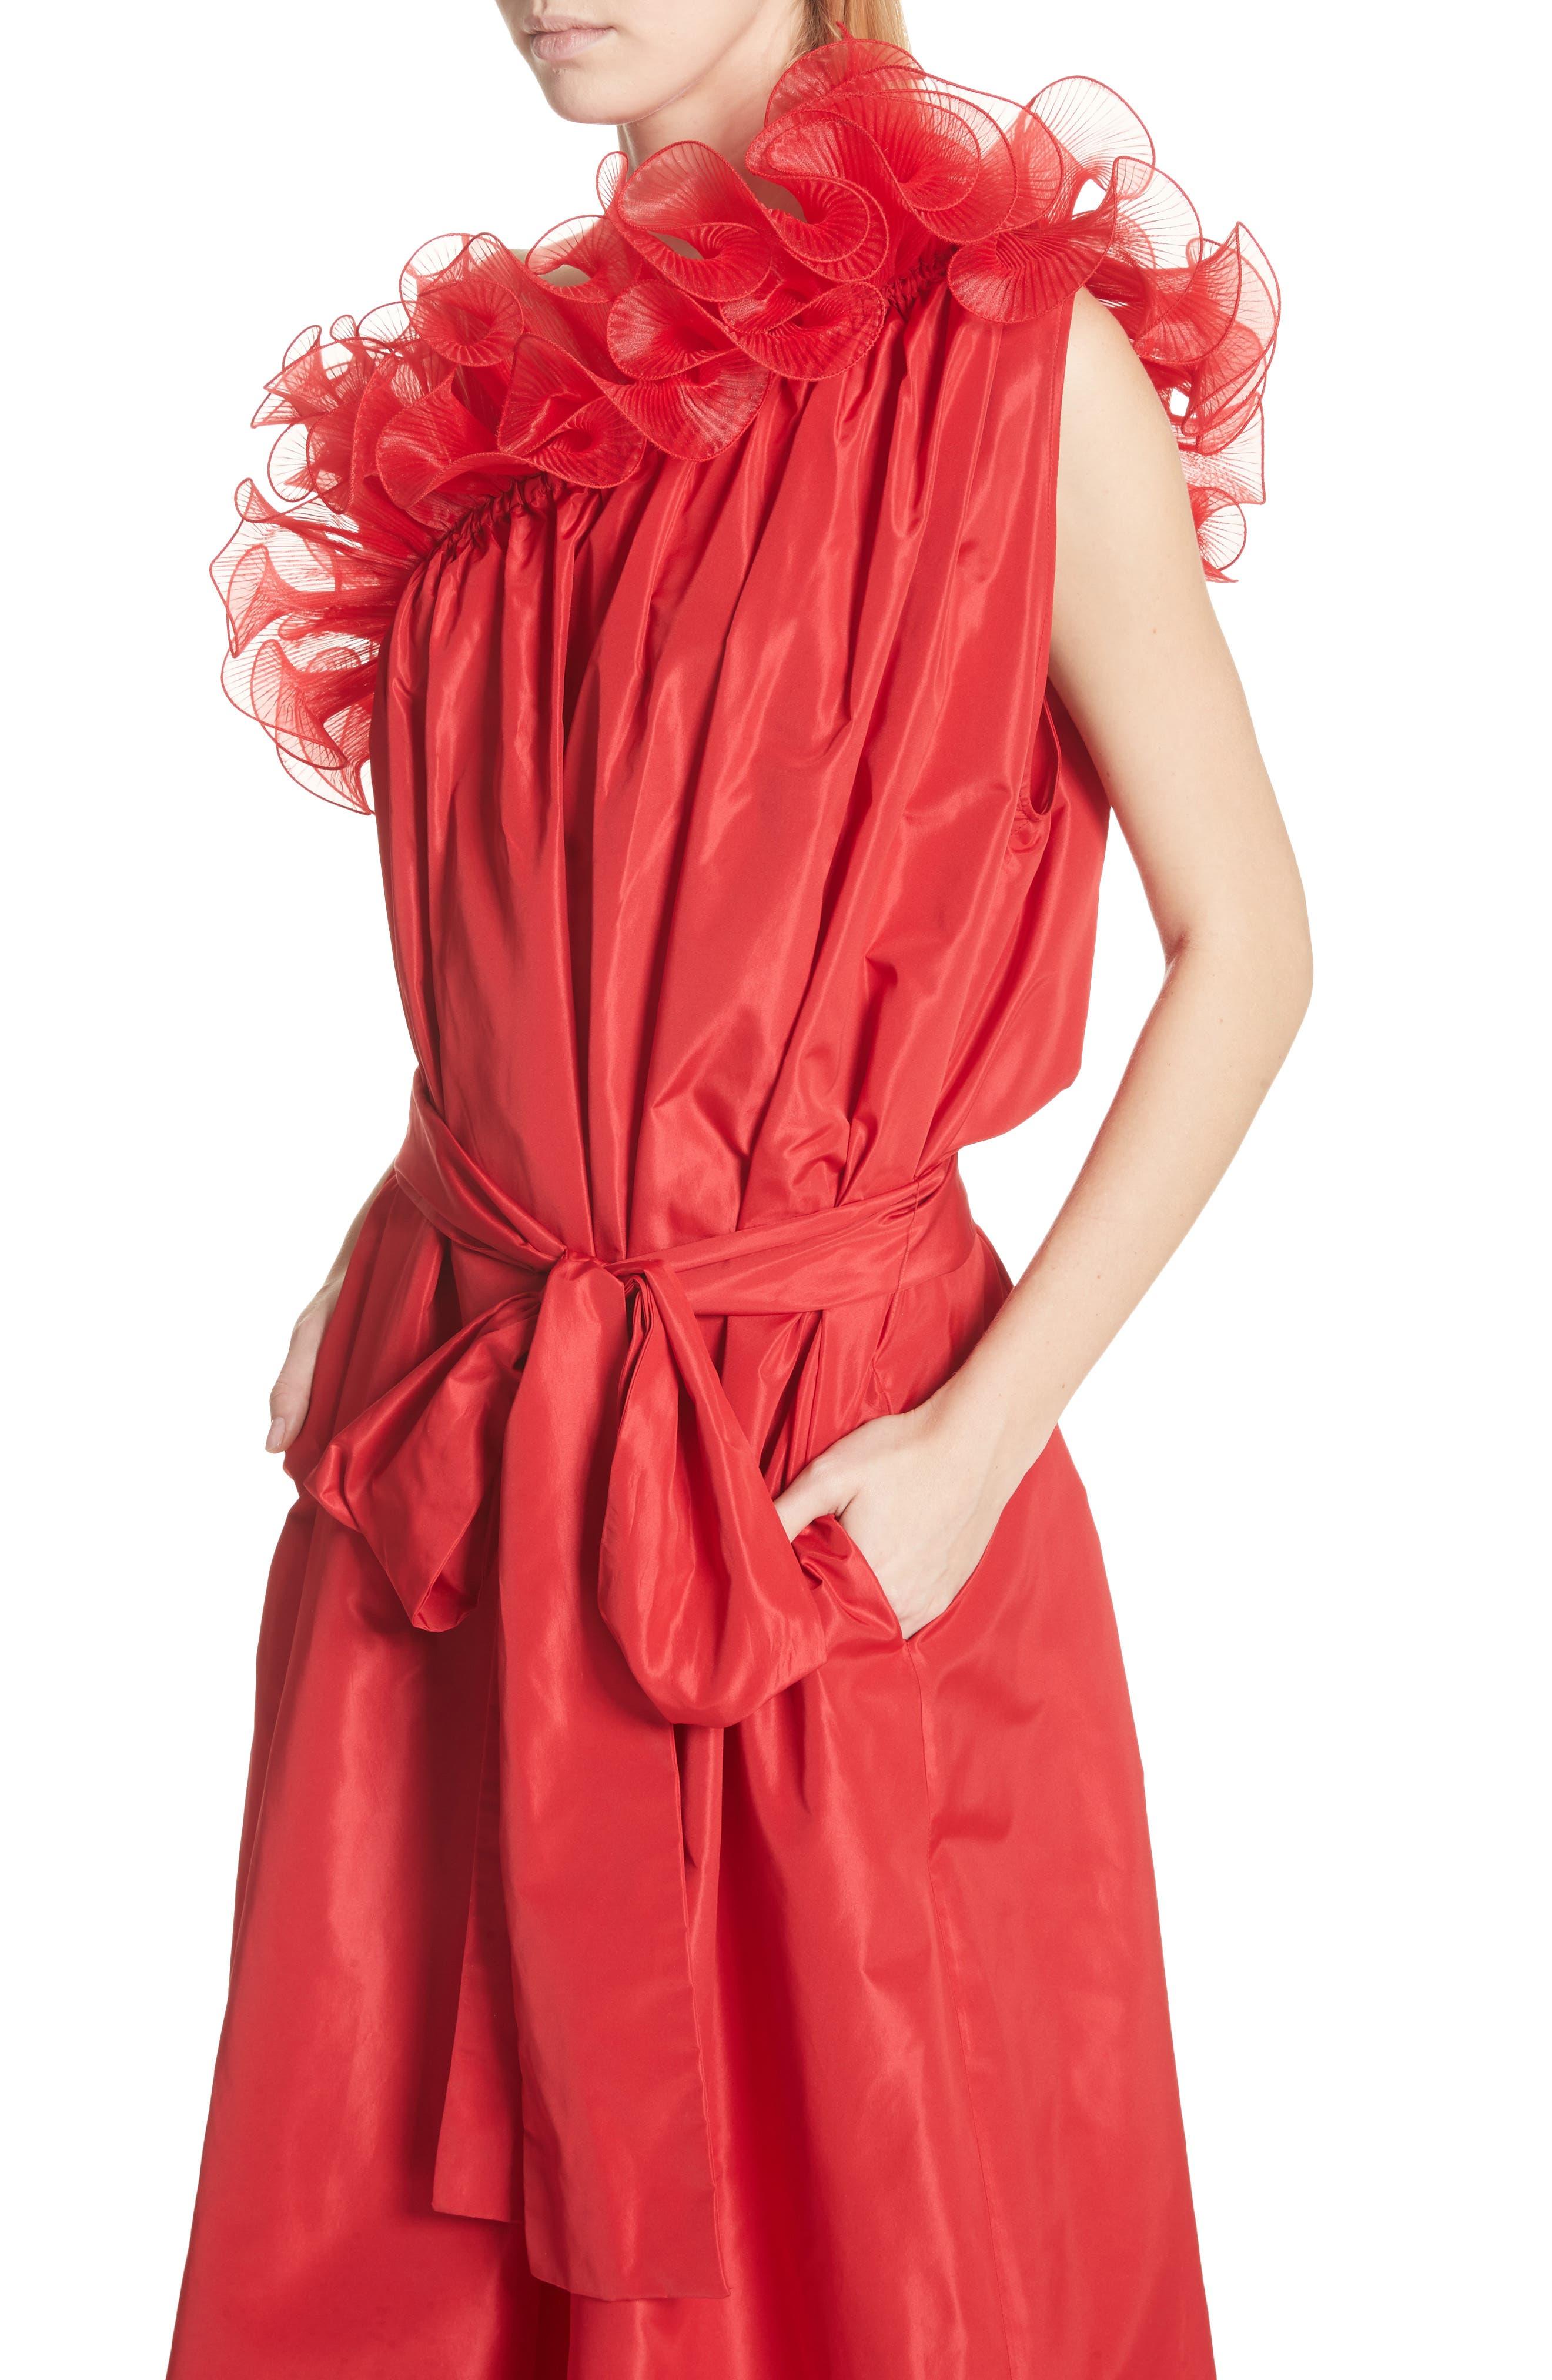 One-Shoulder Ruffle Taffeta Dress,                             Alternate thumbnail 4, color,                             641